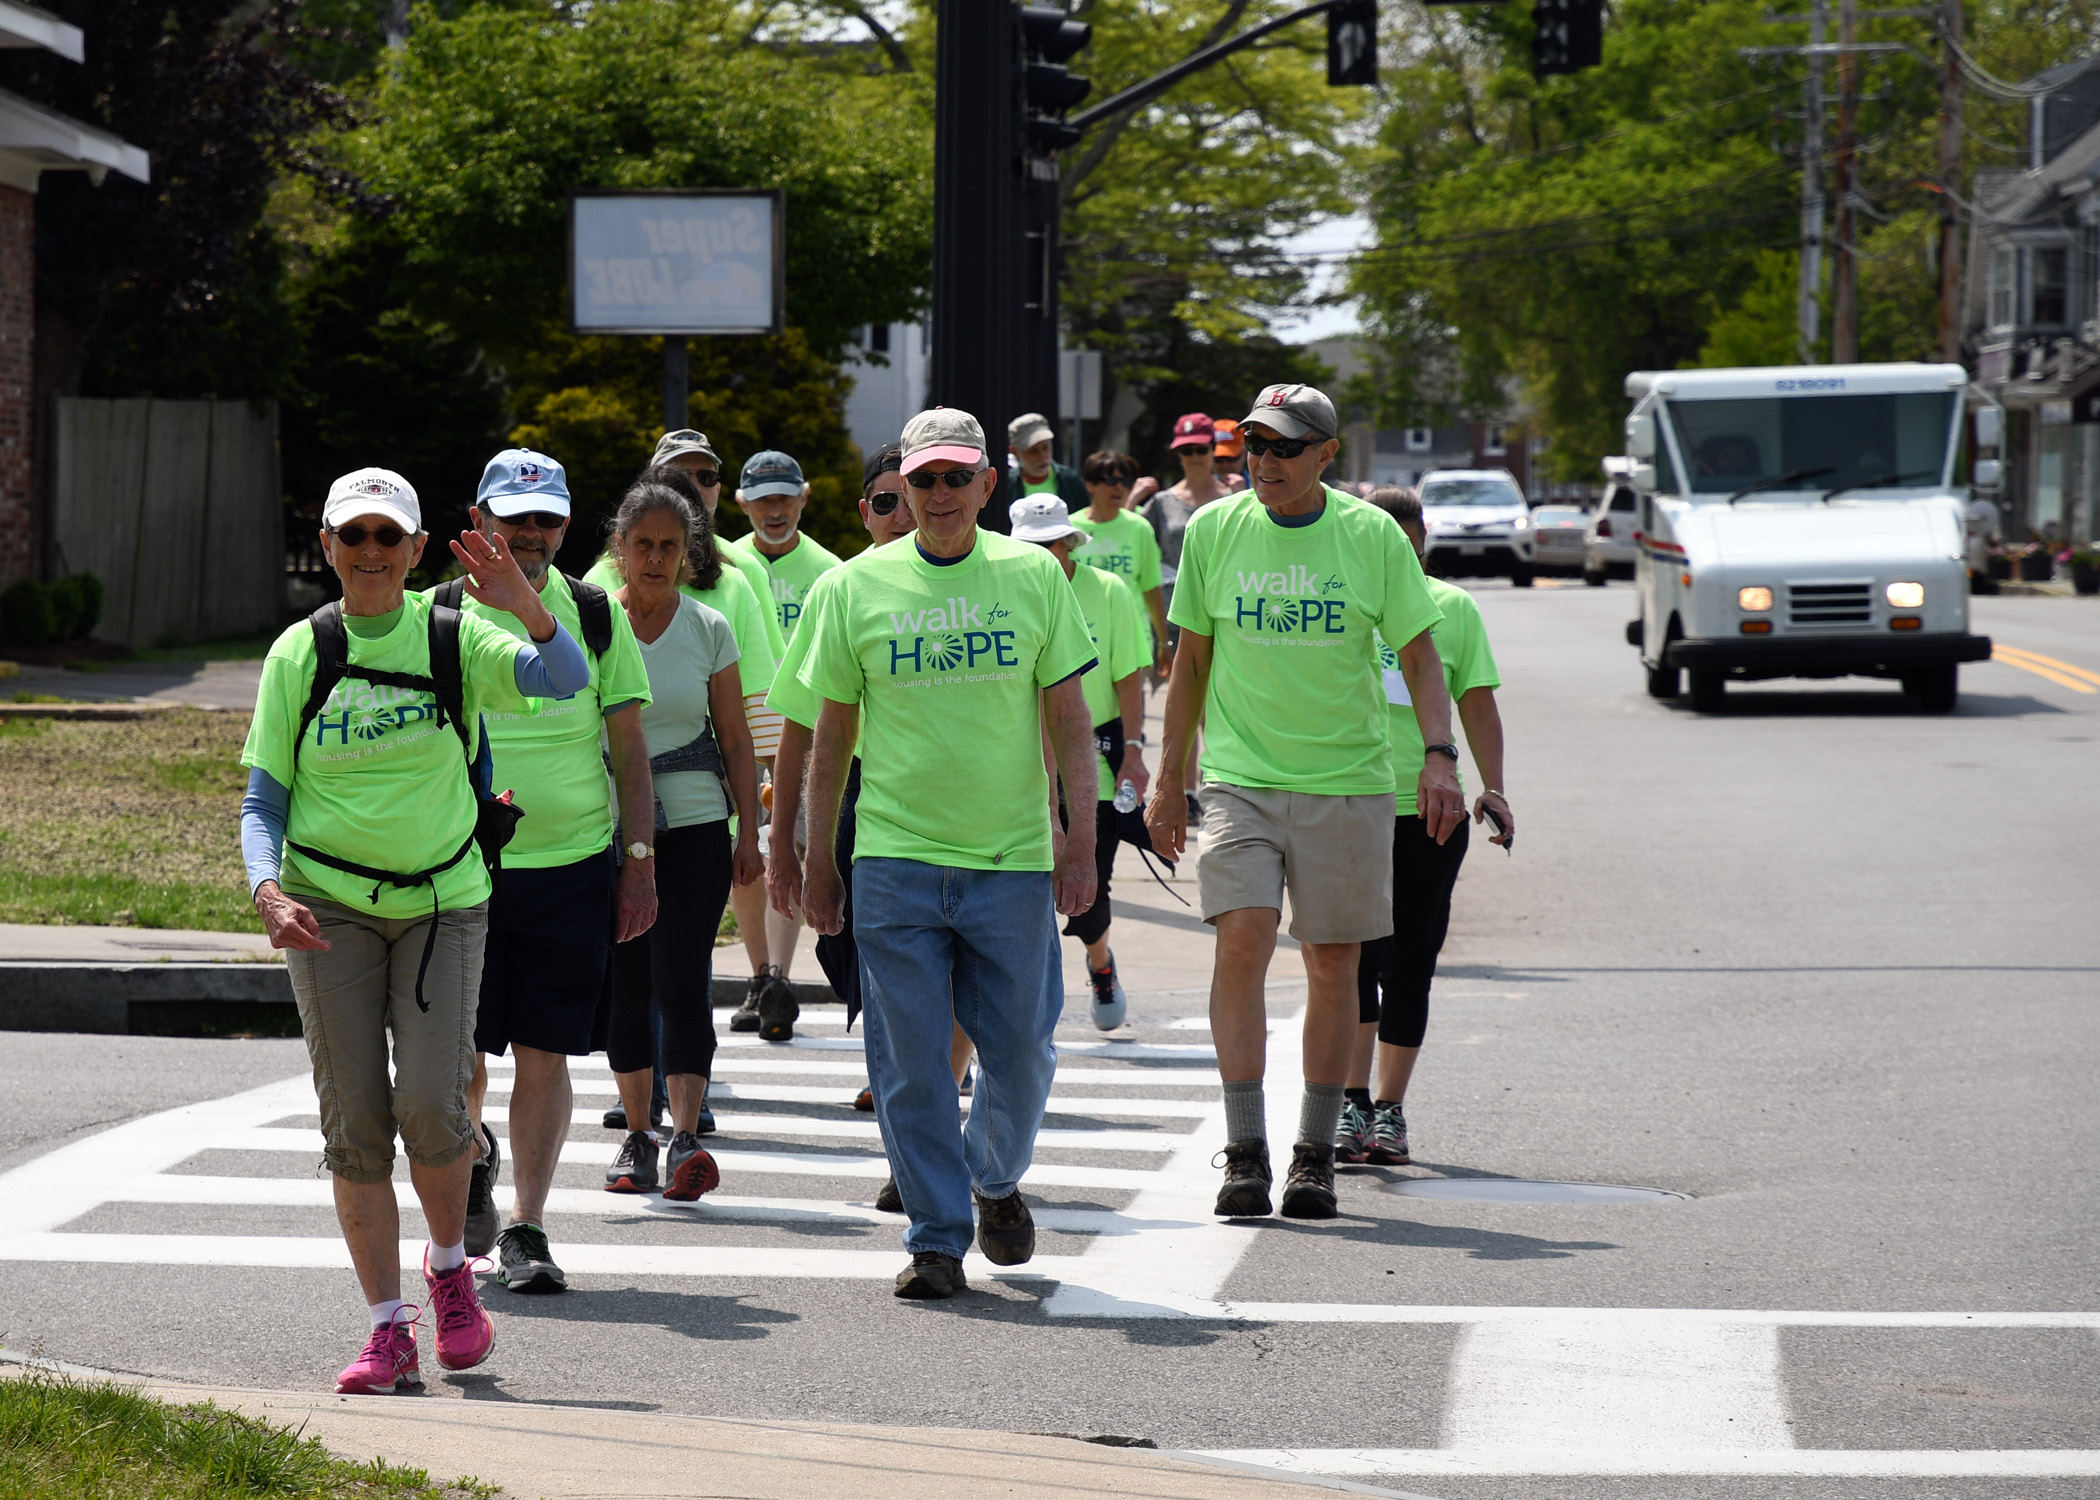 walk for hope walk-a-thon